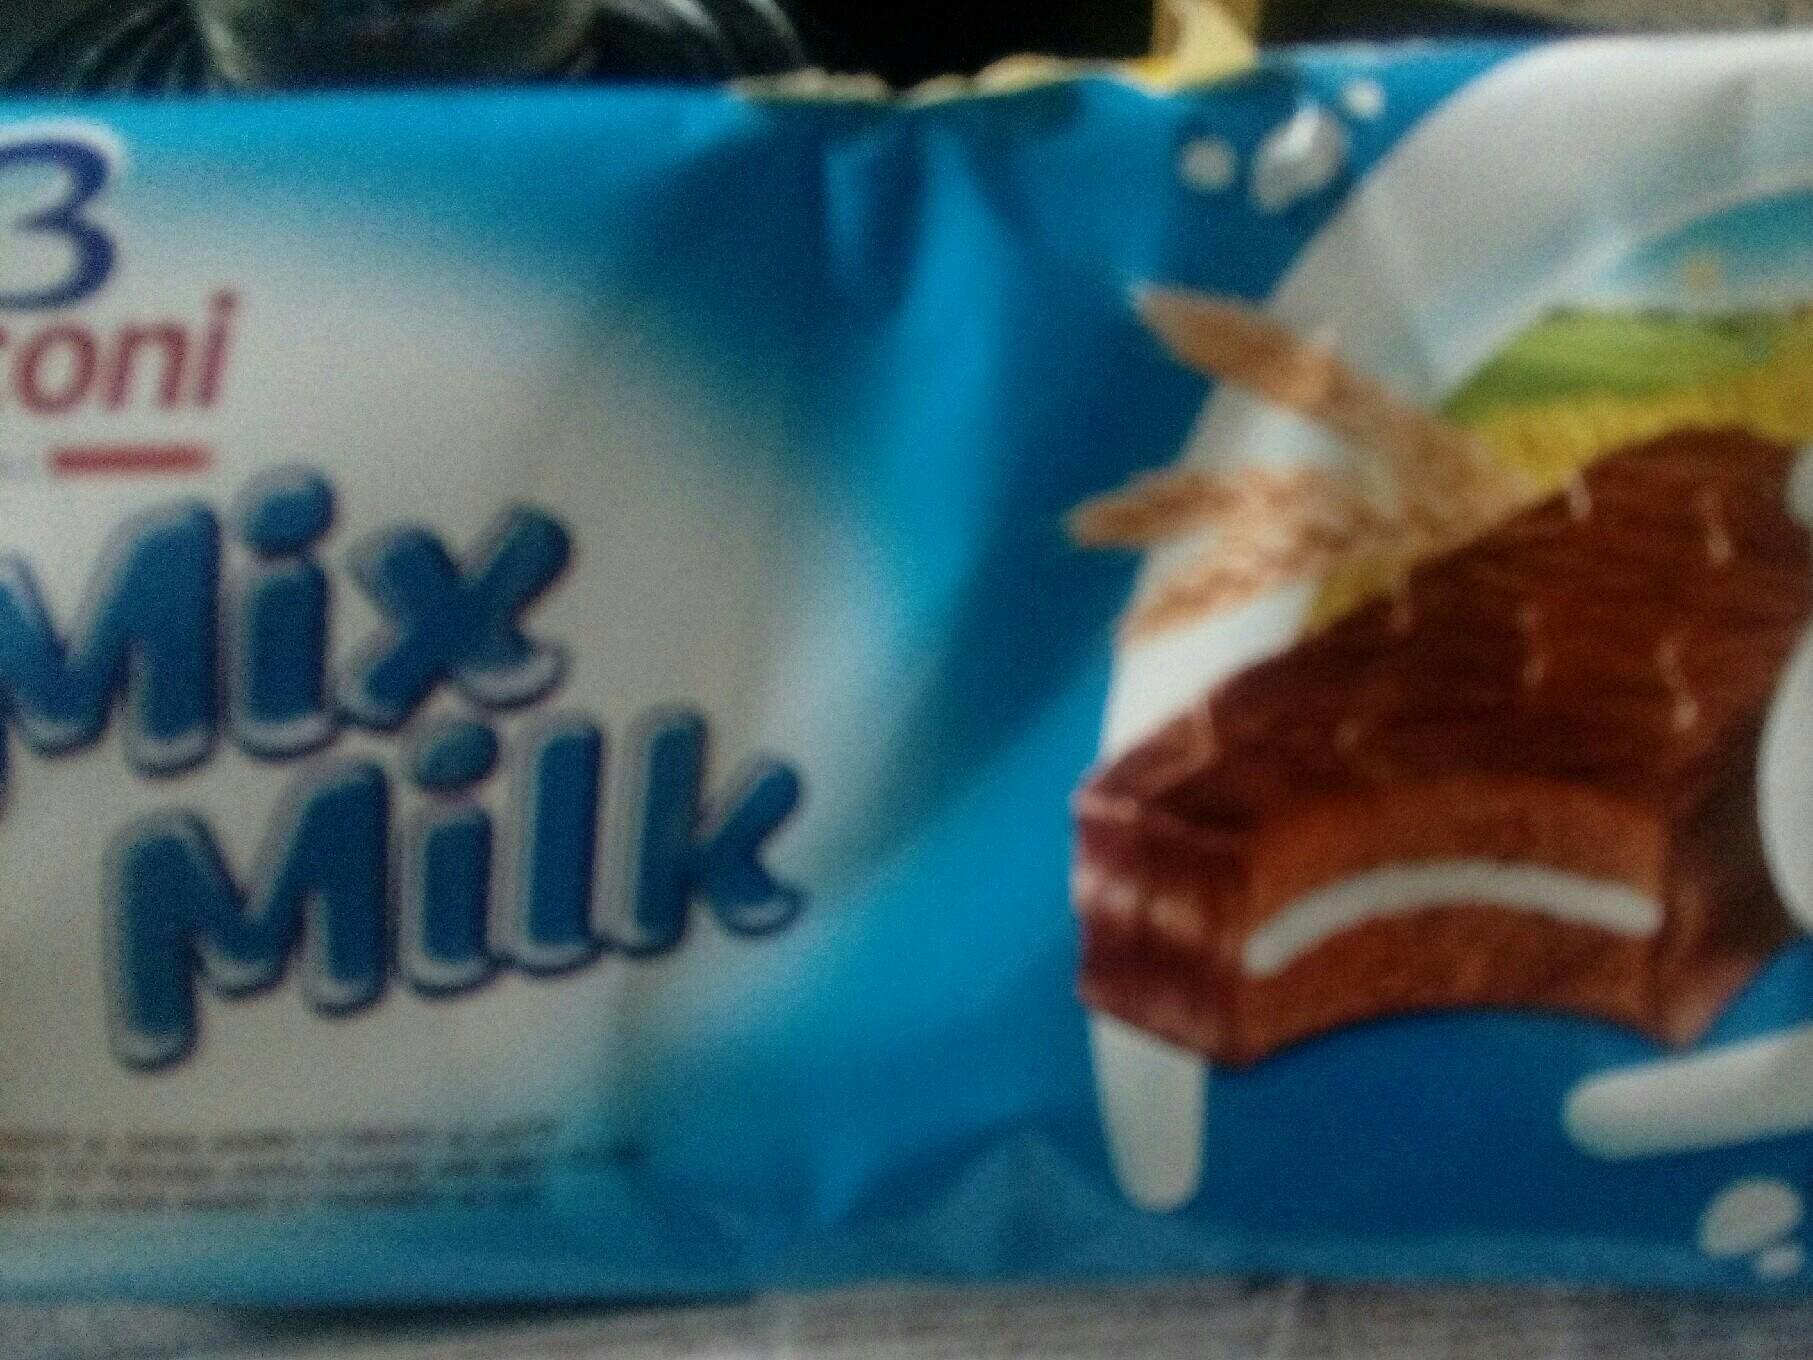 Mix milk - Produkt - fr